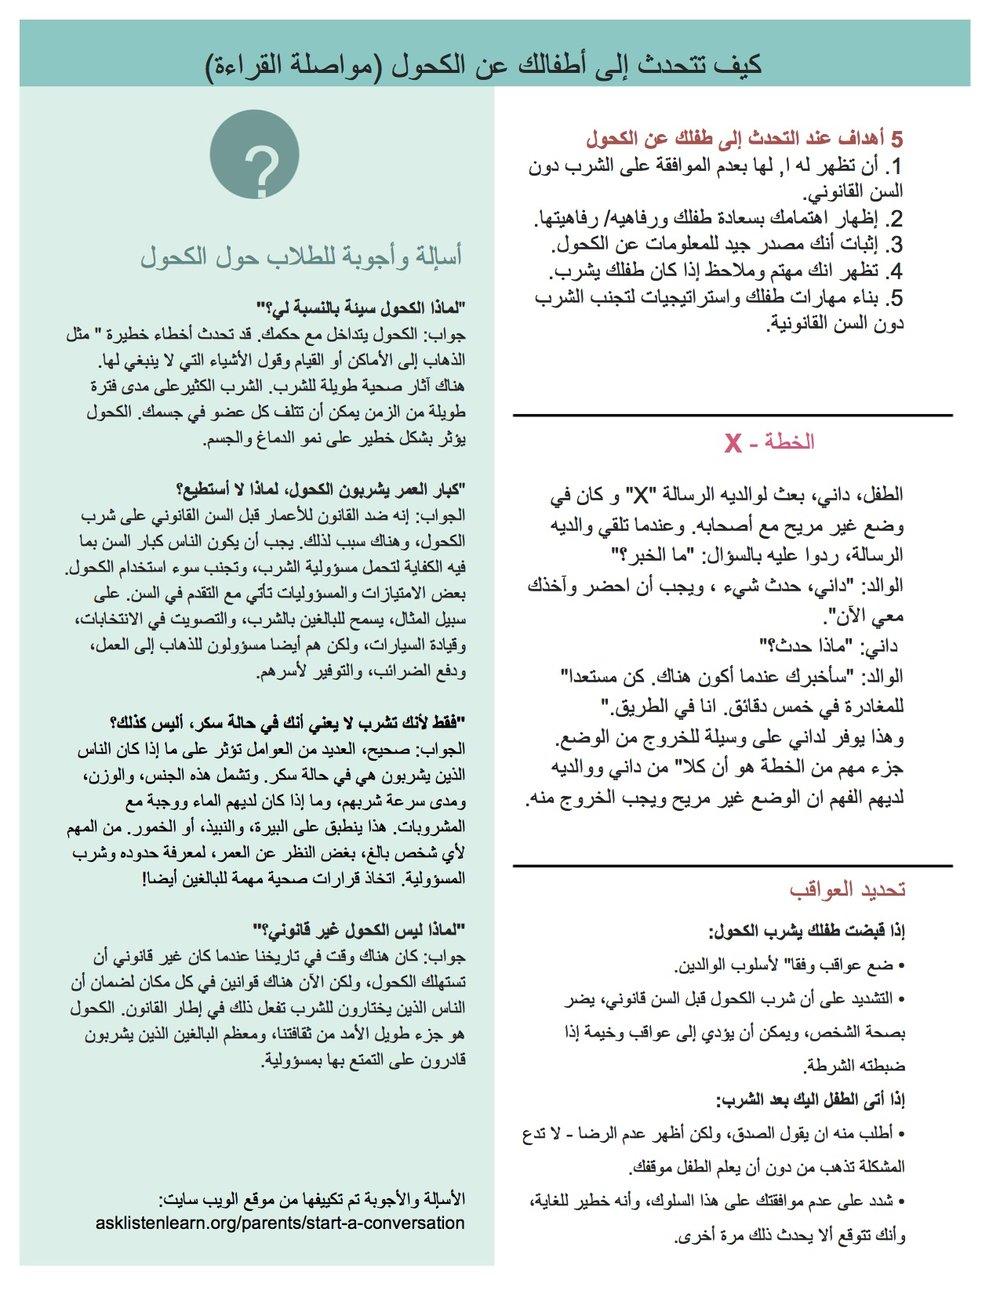 How Fact Sheet_Arabic2.jpg